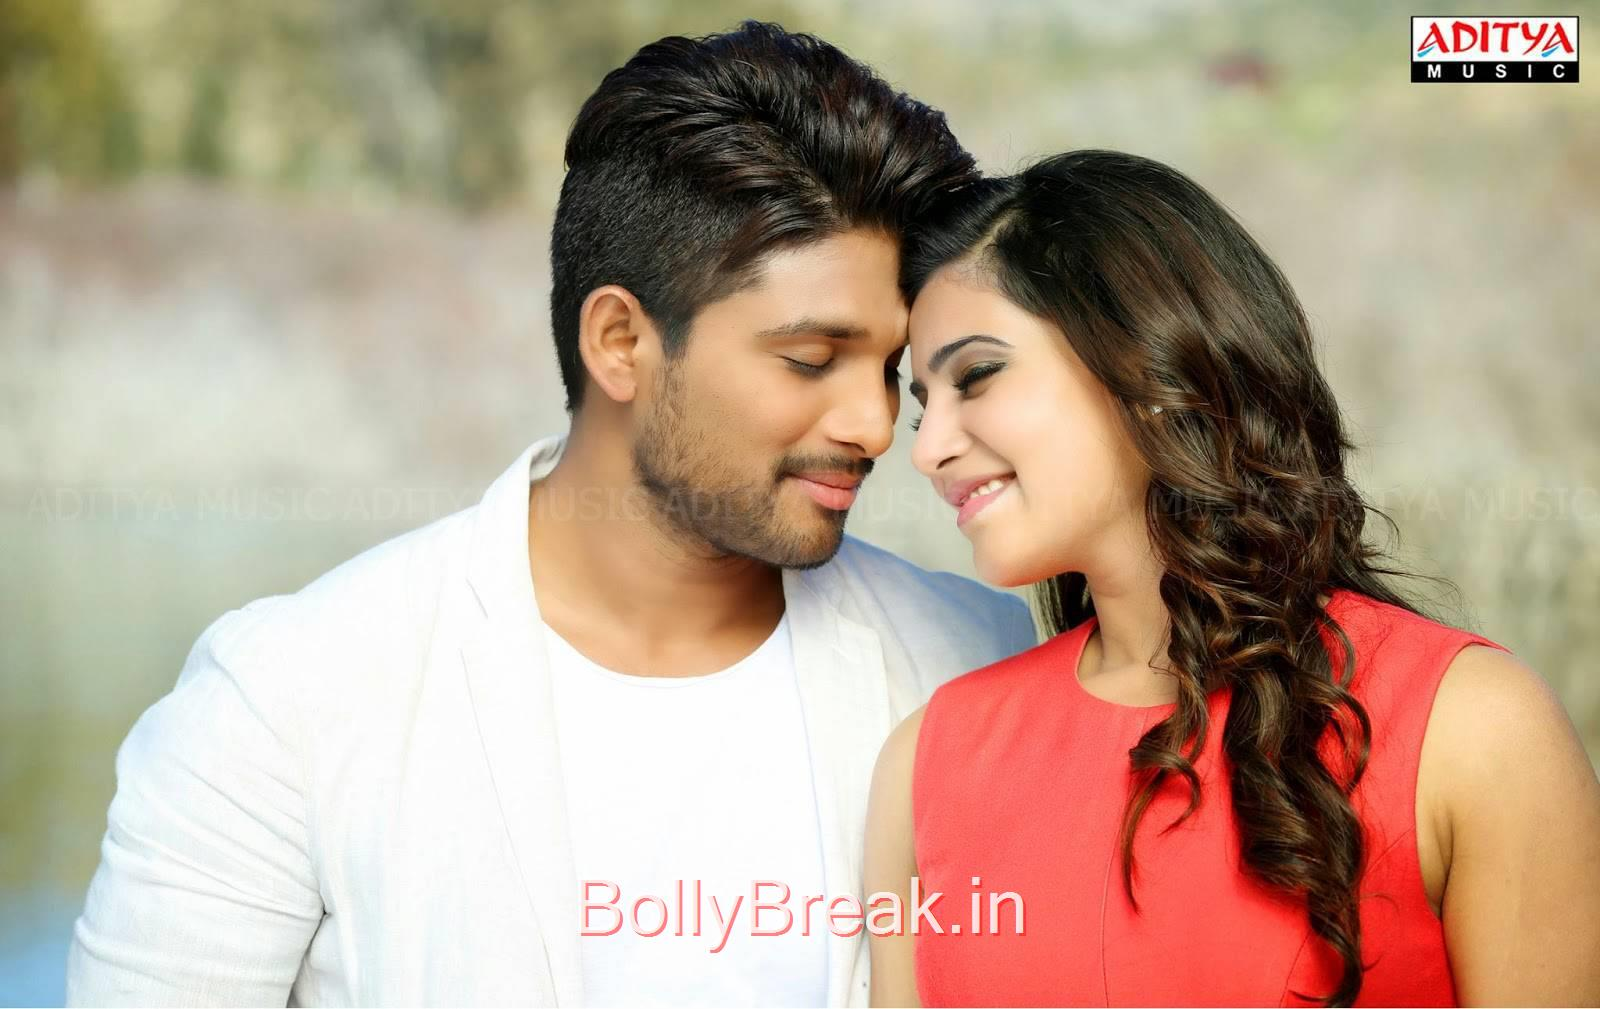 Allu Arjun-Son Of Sathyamurthy Cinema Latest Stills, Nitya Menon Hot HD Pics From Son Of Sathyamurthy Movie